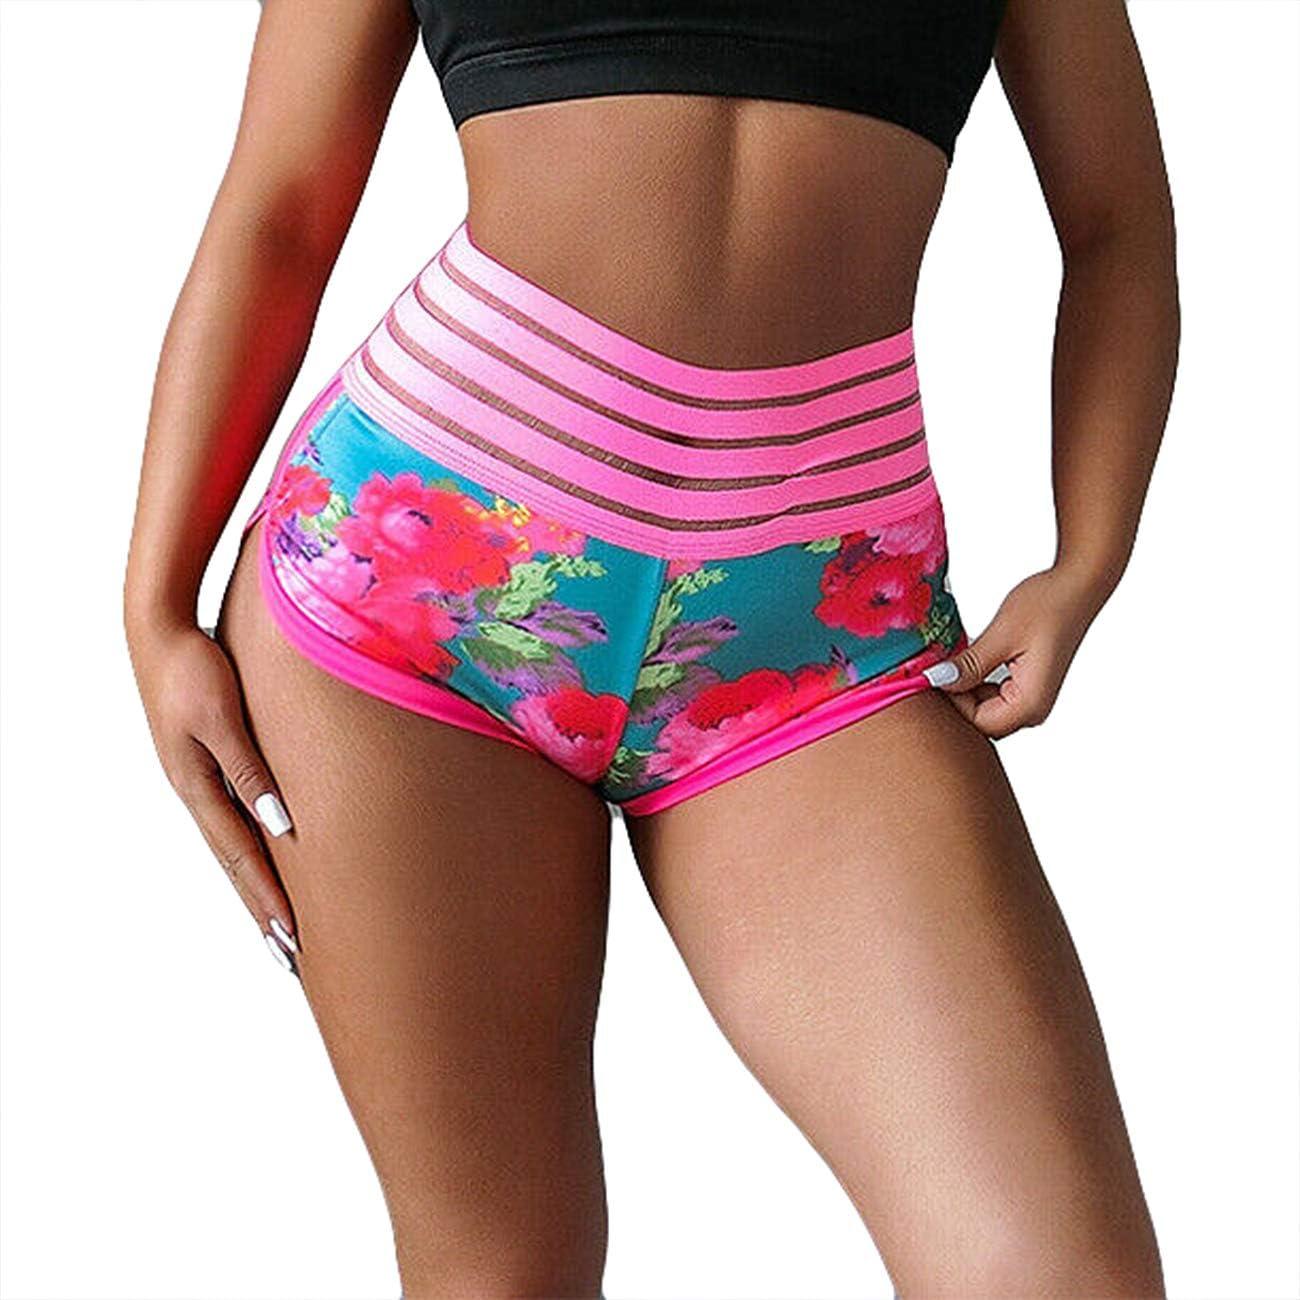 Folima Womens Yoga Scrunch Butt Shorts High Waist Workout Running Gym Shorts Tummy Control